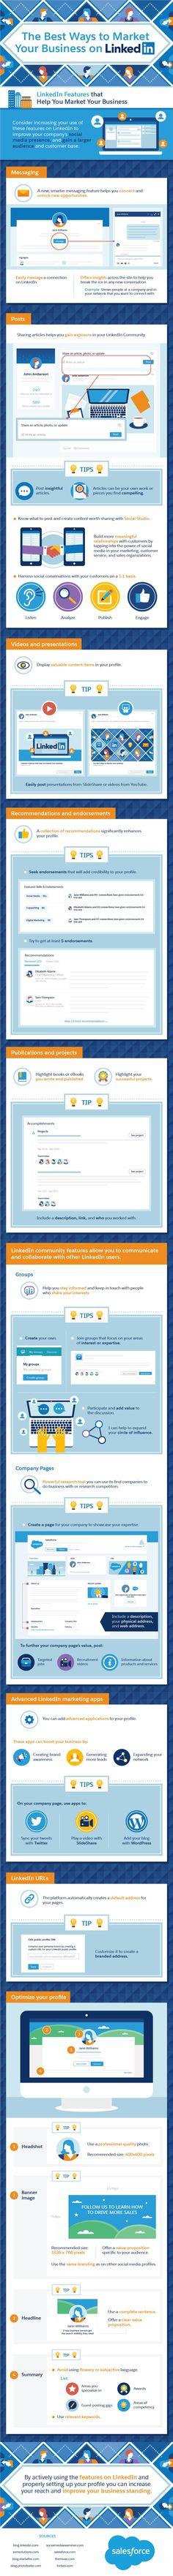 87 best eMarketing images on Pinterest | Internet marketing, Social ...